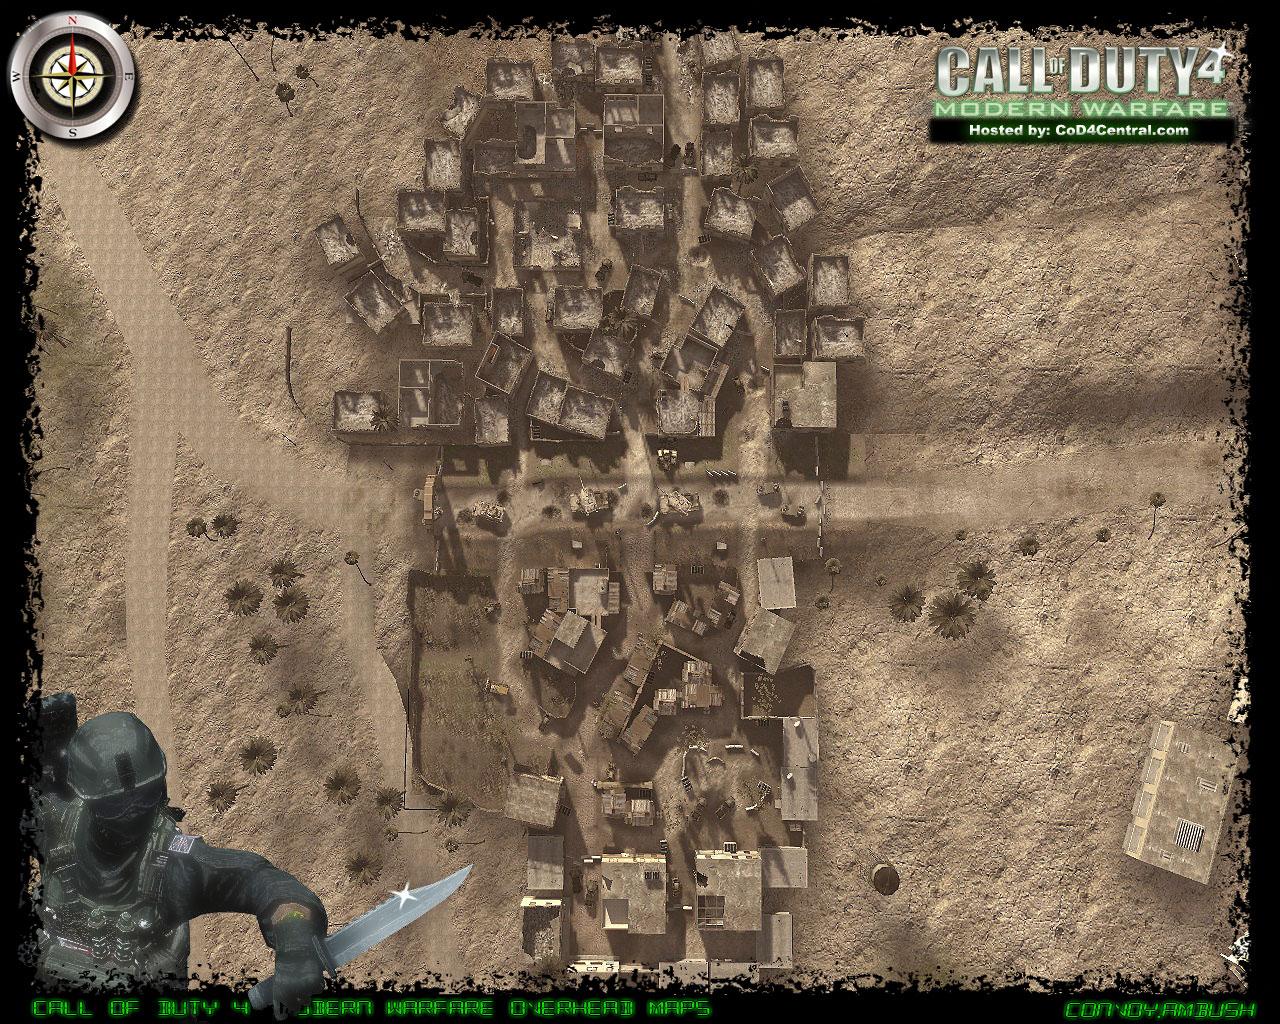 Call of Duty 4 Maps - Gallery | eBaum's World Call Of Duty All Maps on commander keen 4 maps, modern warfare maps, battlefield 4 maps, midnight club 4 maps, black ops maps, gears of war 4 maps, call of duty 3 maps, call of duty: roads to victory, call of duty zombie maps, sins of a solar empire maps, assassin's creed 4 maps, call of duty all maps, call of duty waw maps, super smash bros 4 maps, call of duty uo maps, fallout 4 maps, advanced warfare maps, call of duty 2 maps, call of duty ghosts maps, call of duty world at war maps,